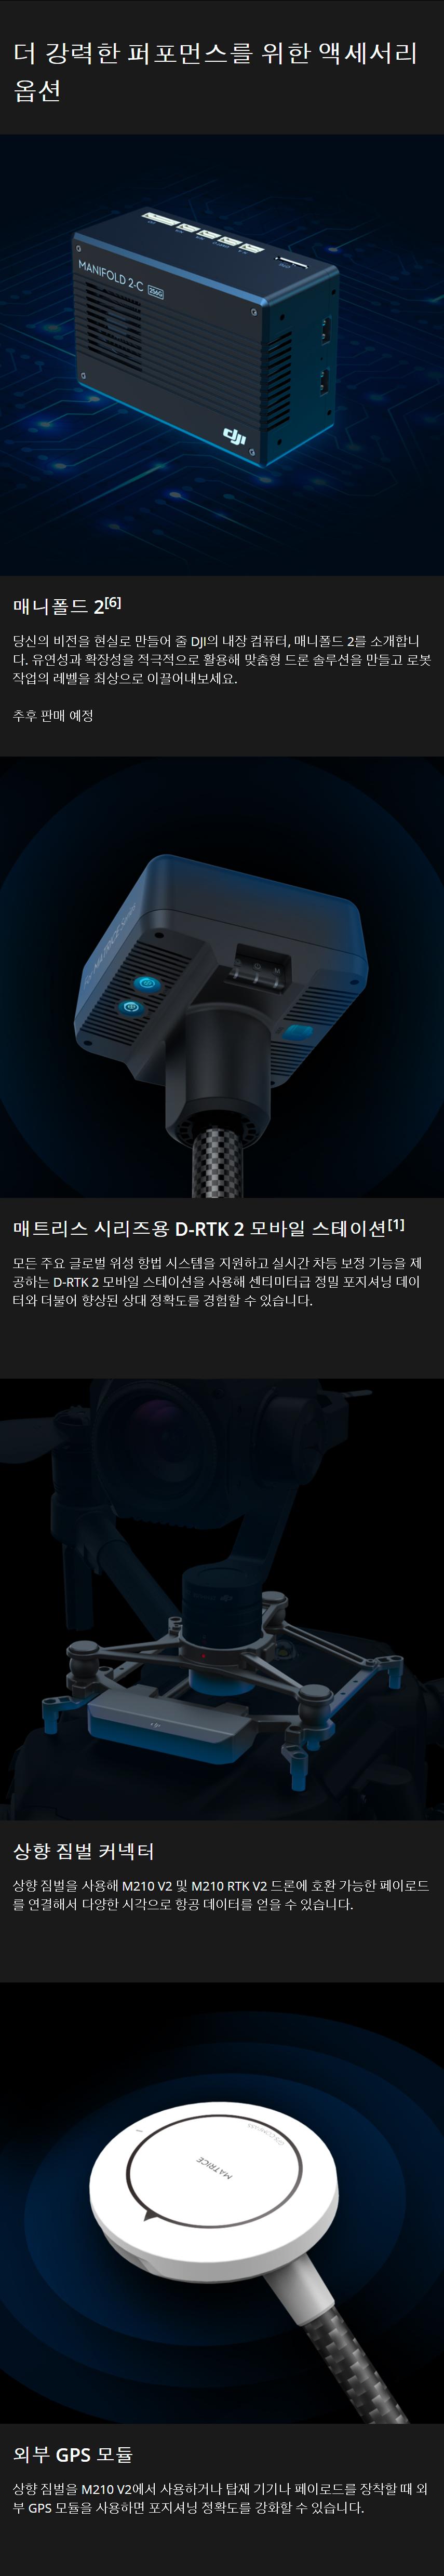 DJI MATRICE 200 V2 매트리스 200 V2 드론 코세코